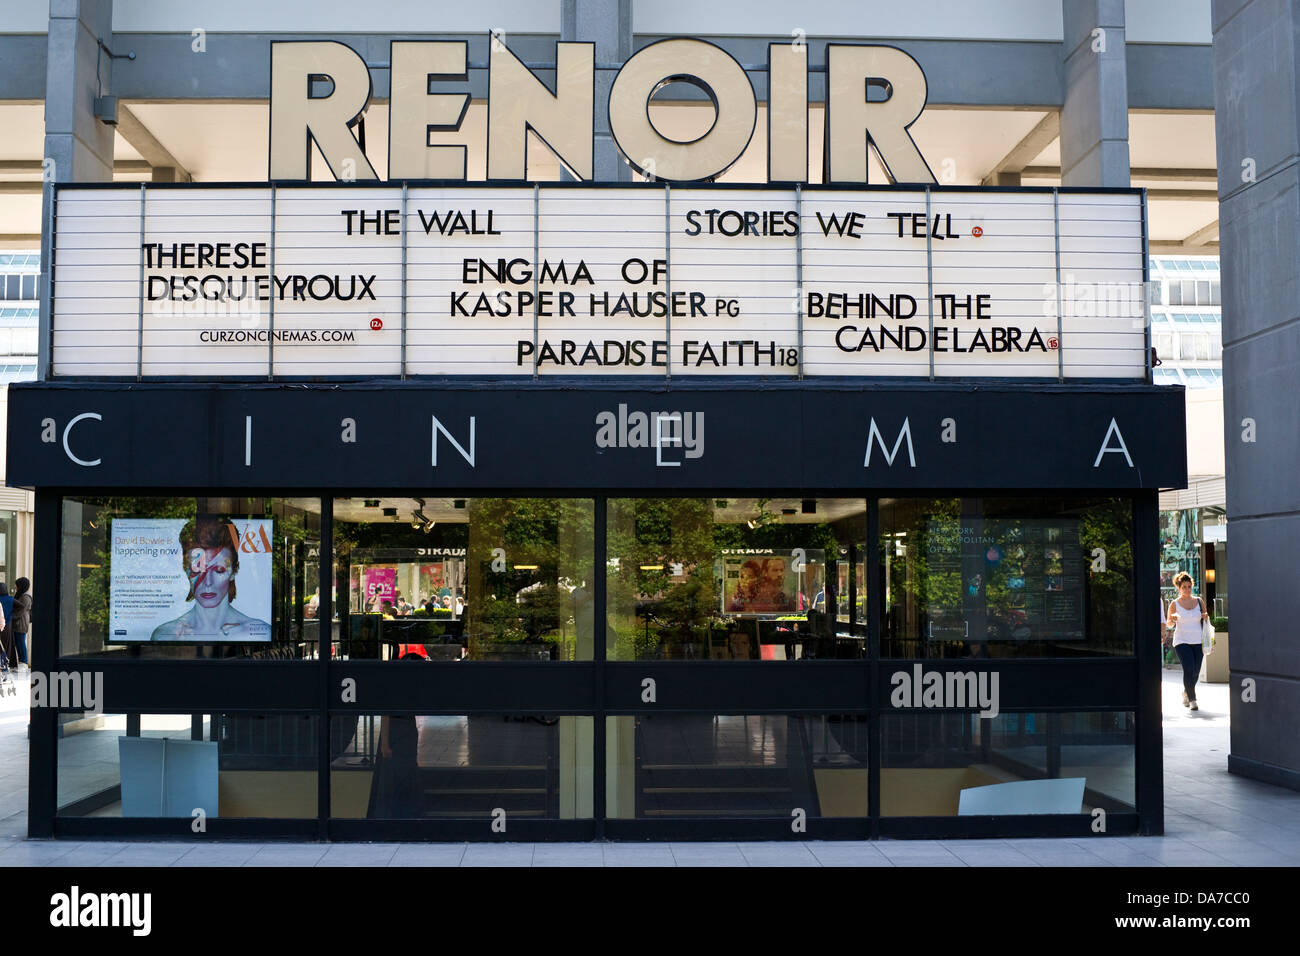 The Renoir Cinema, London - Stock Image